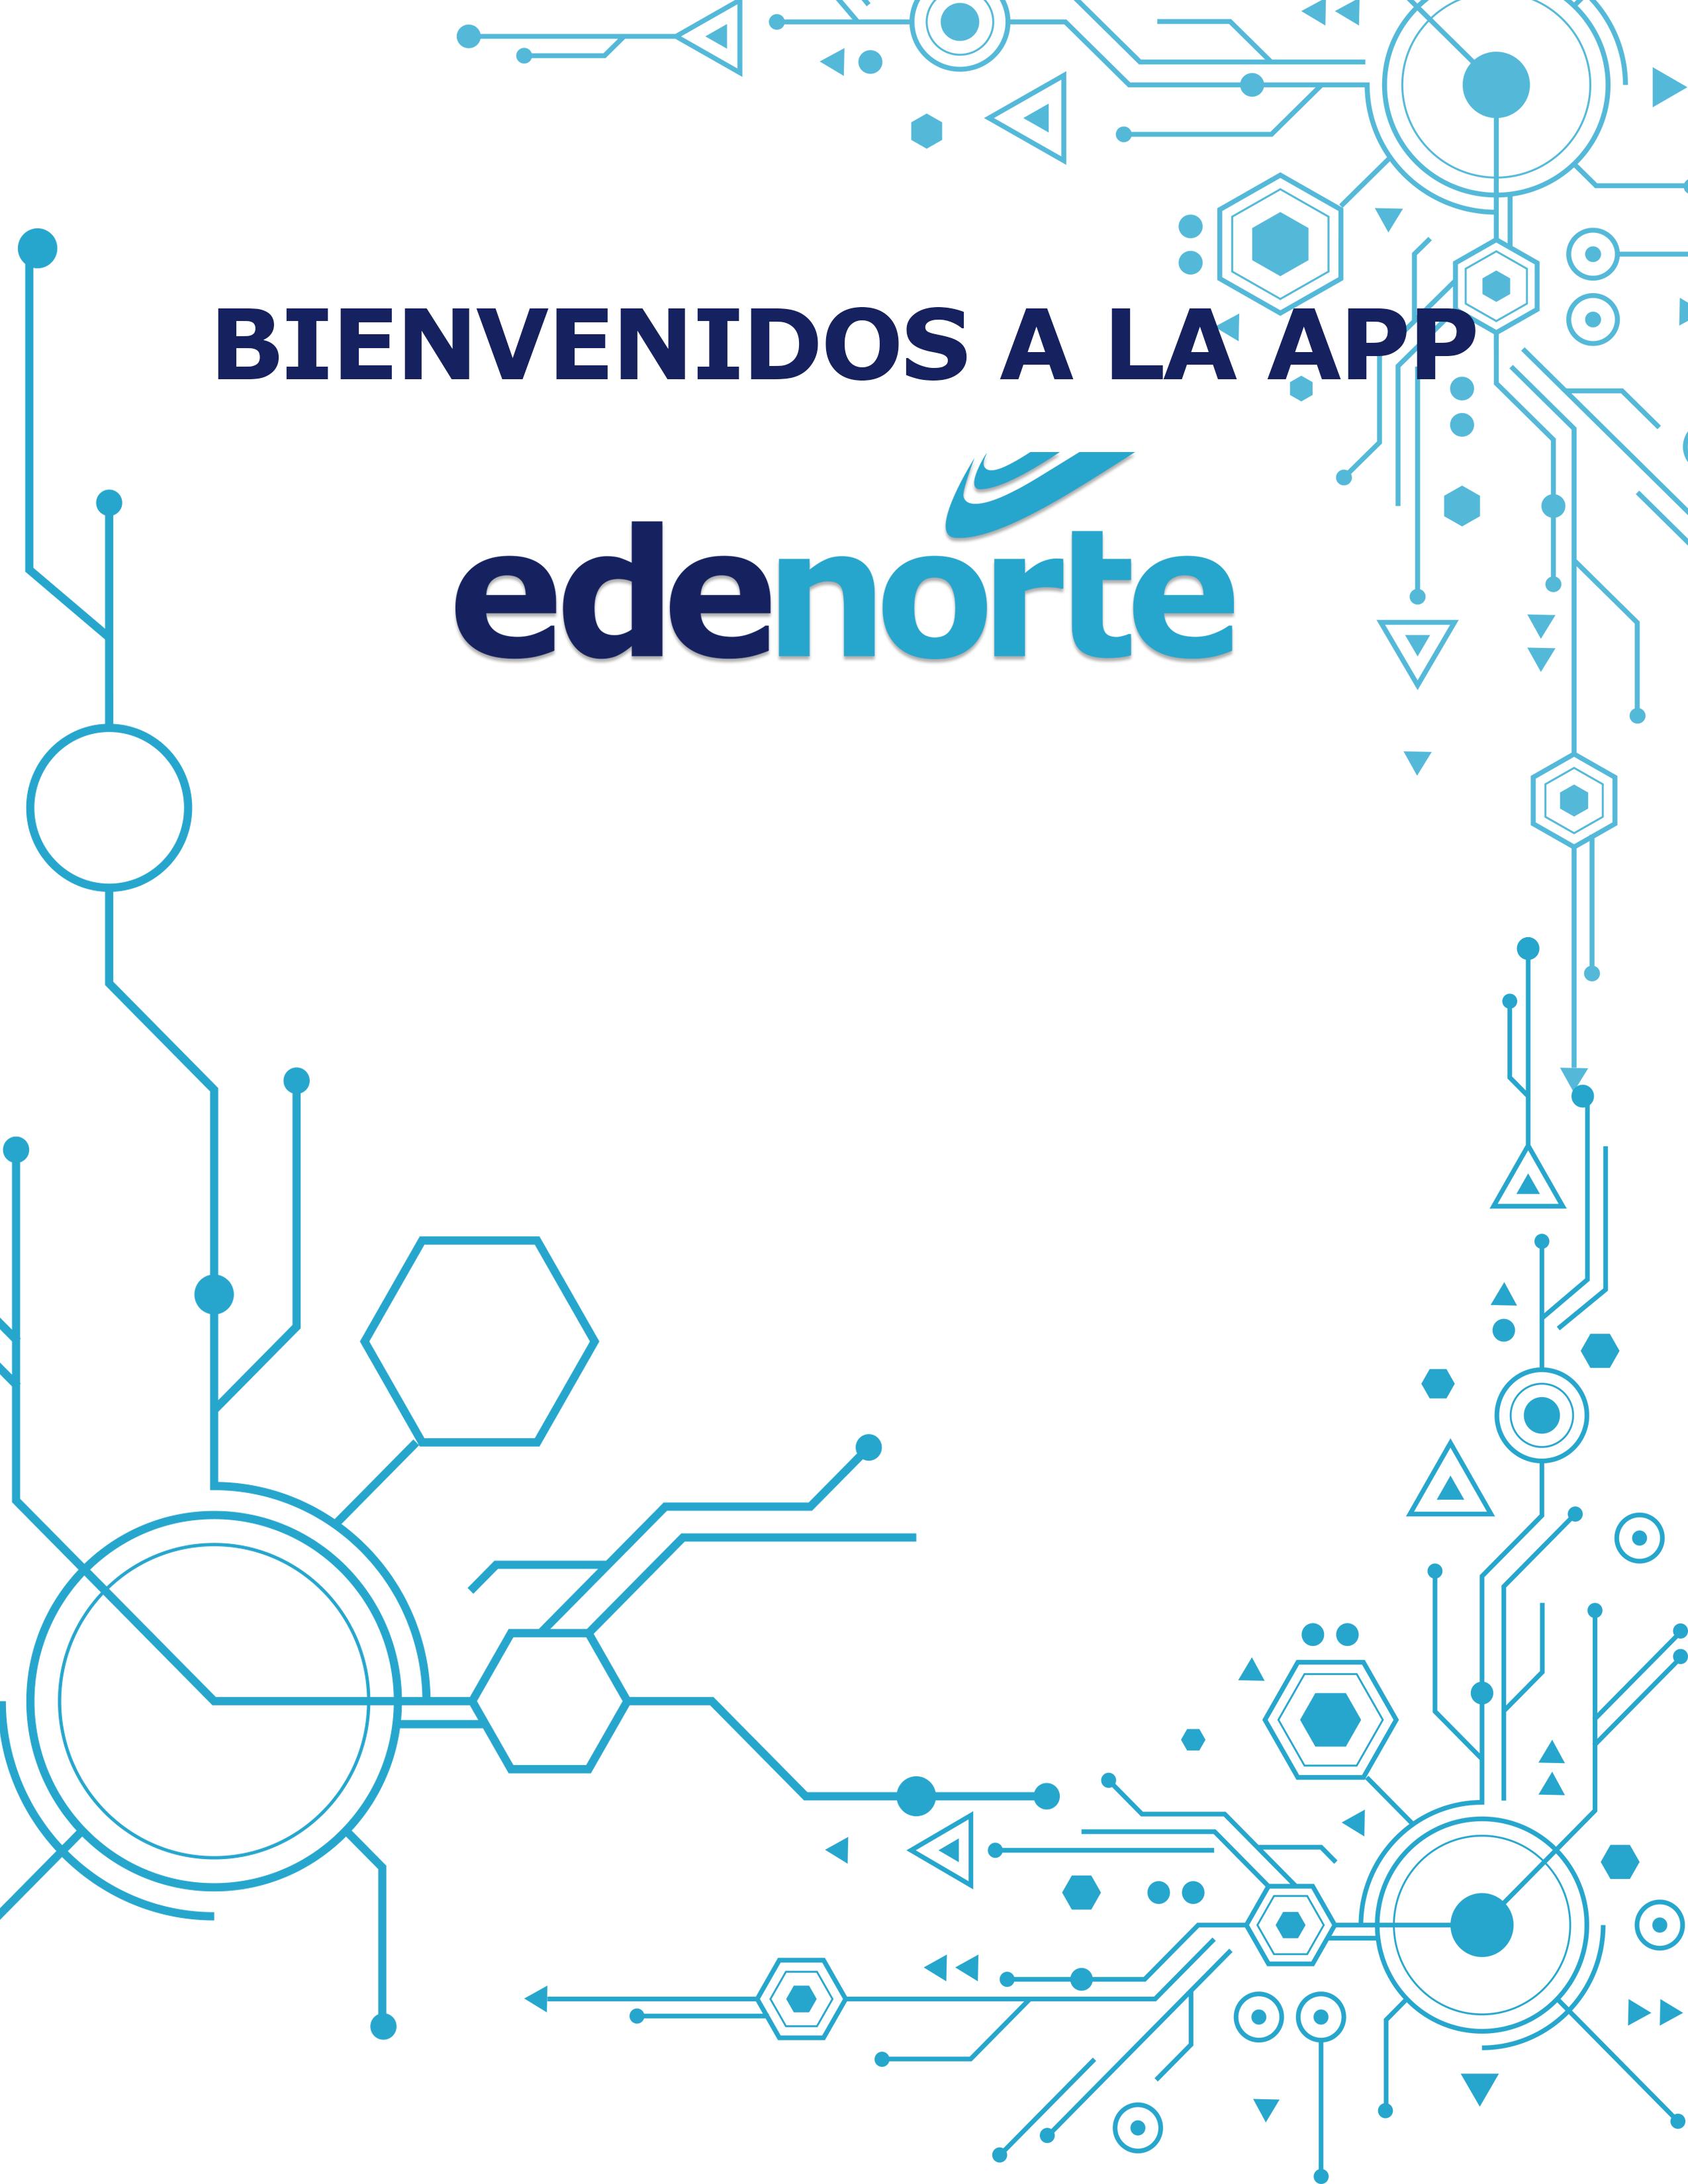 EdenorteApp